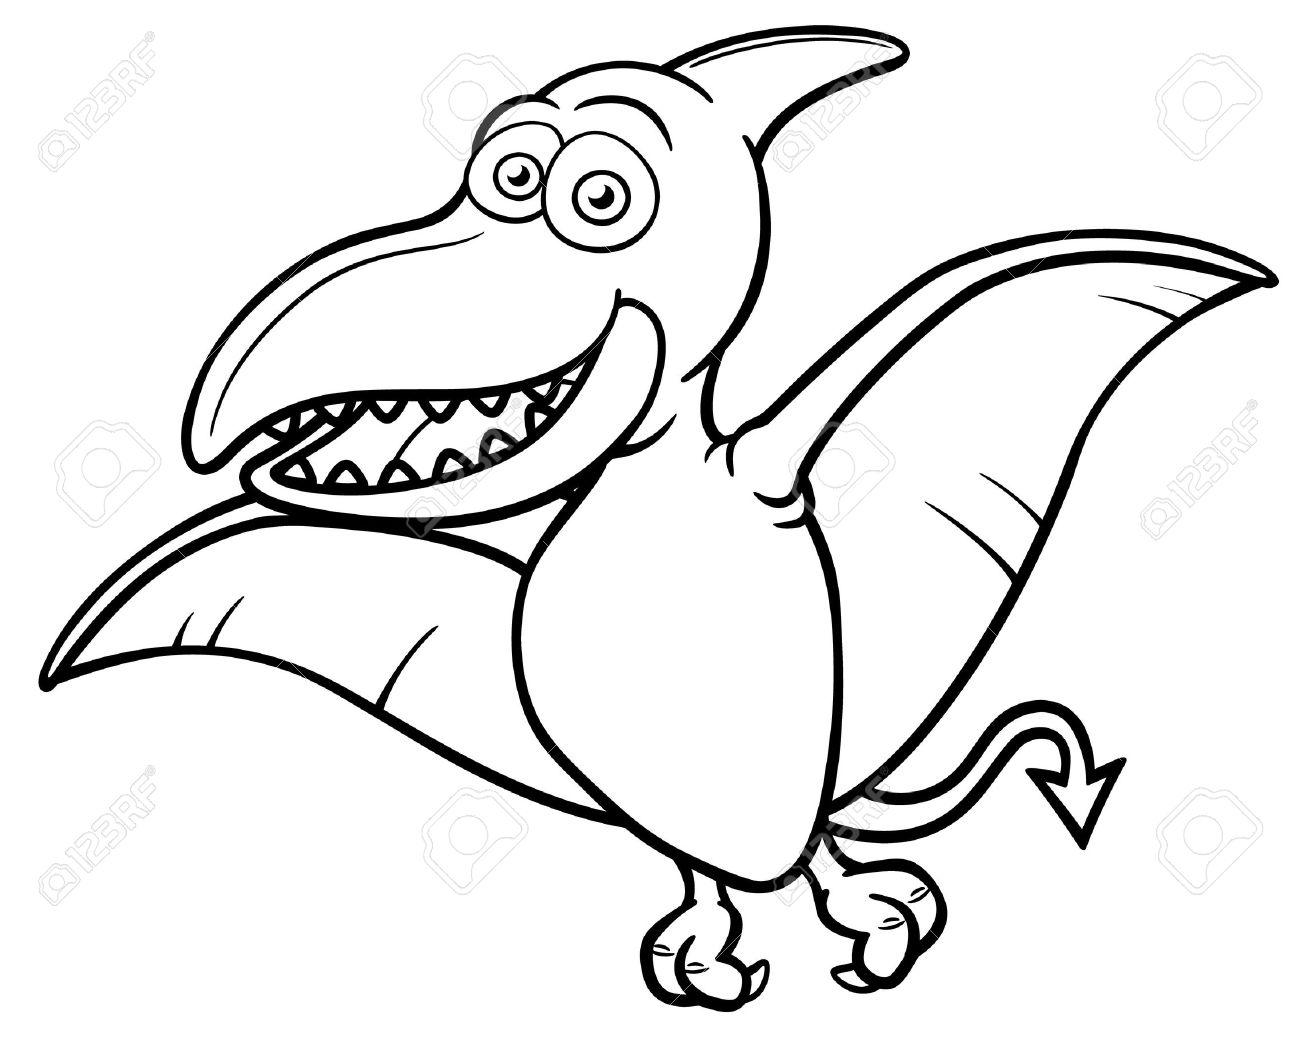 Vector illustration of Cartoon pteranodon - Coloring book Stock Vector - 20685368